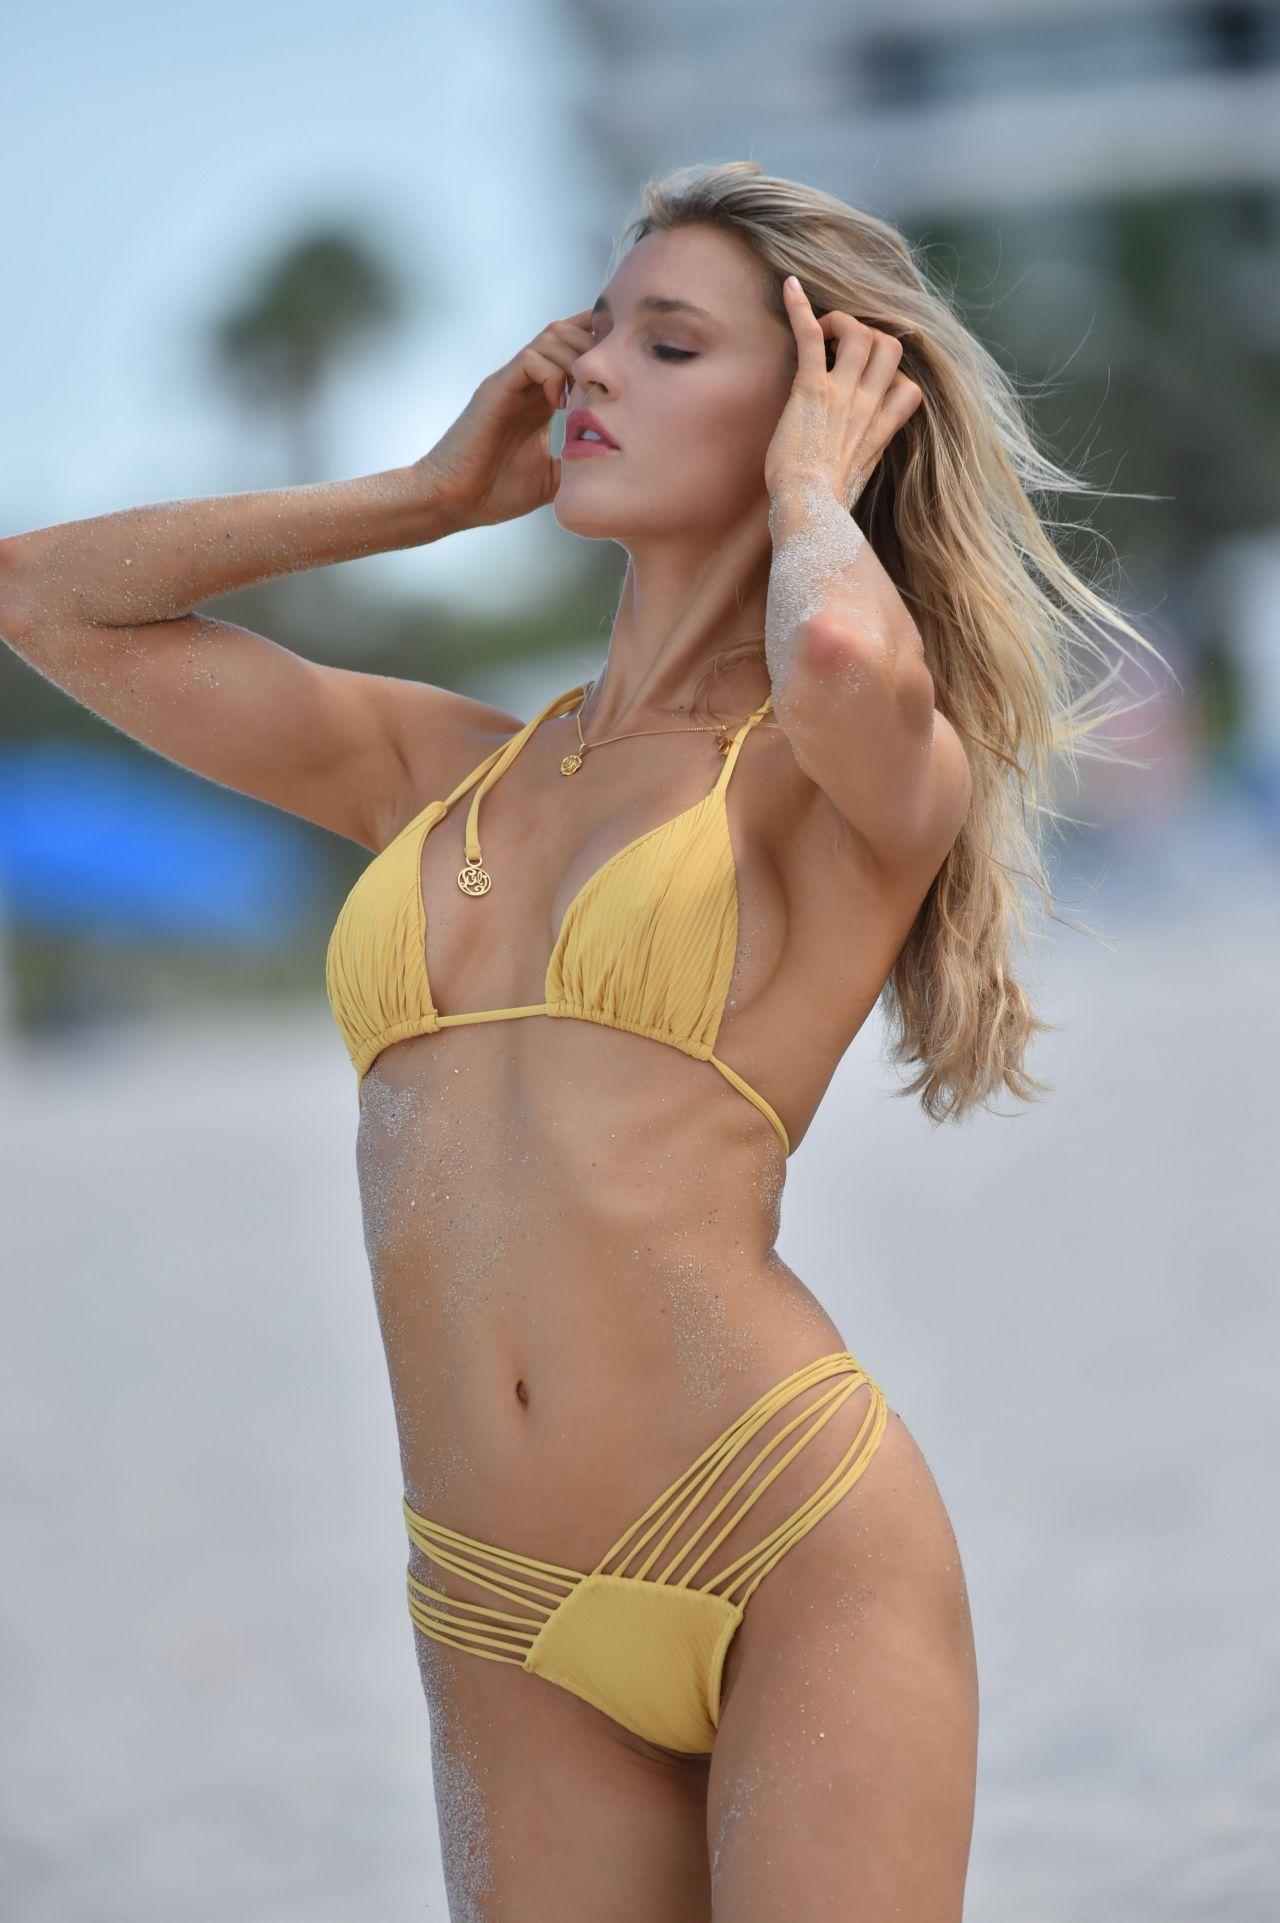 Joy Corrigan Bikini Photoshoot - Miami Beach 07/12/2018